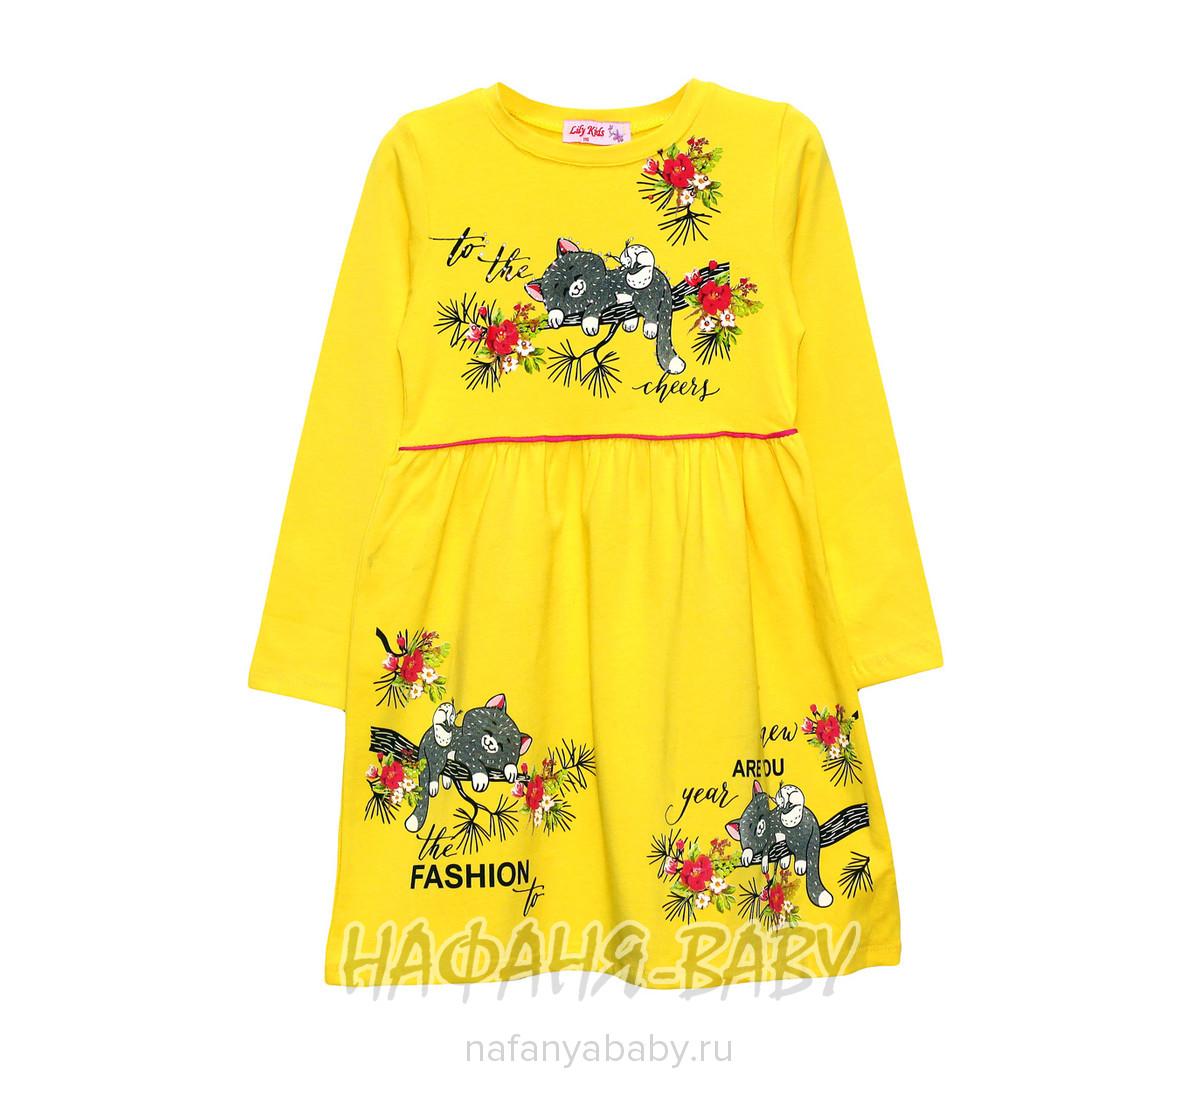 Детское платье LILI KIDS арт: 3039, 1-4 года, 5-9 лет, оптом Турция